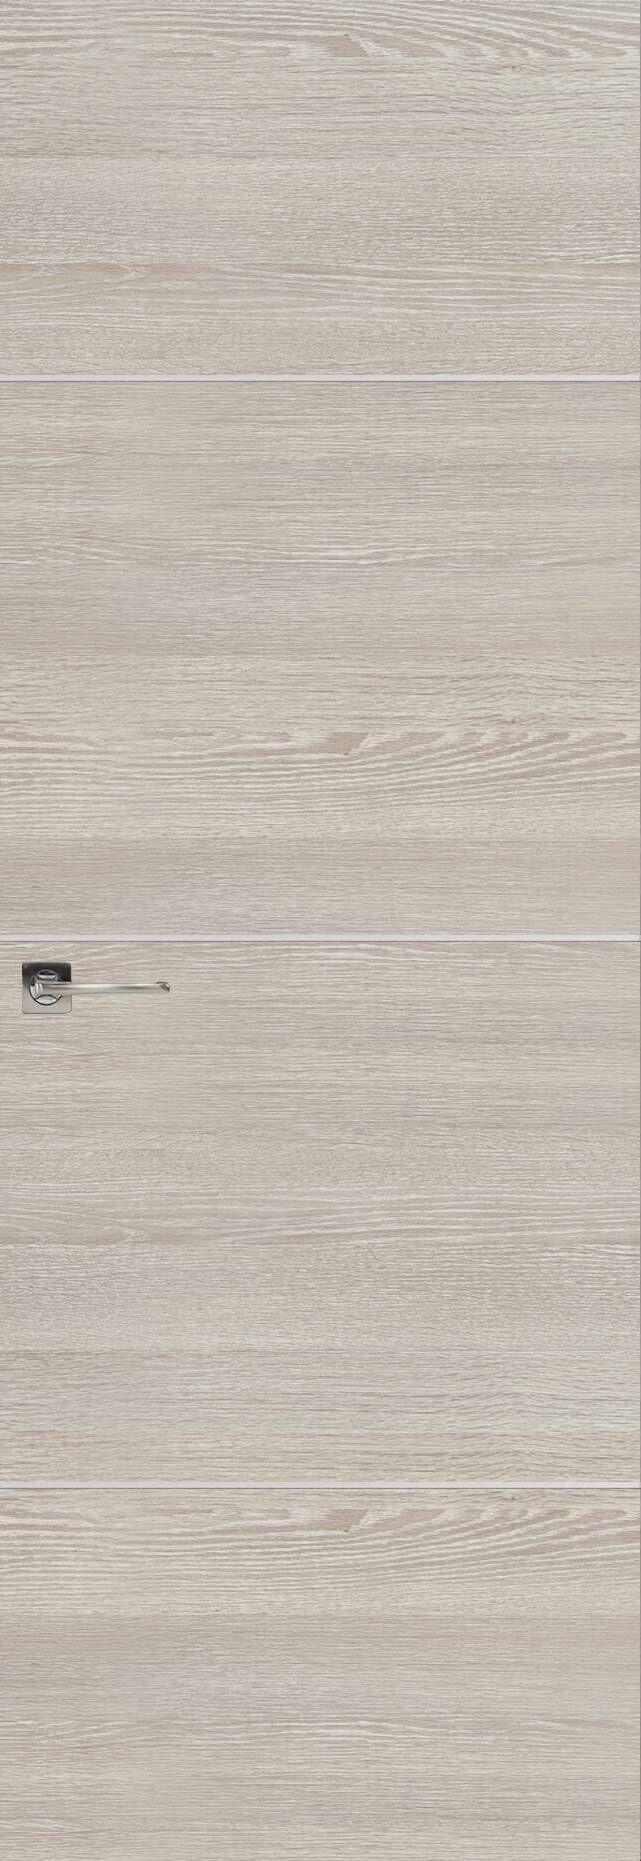 Tivoli Г-3 Invisible цвет - Серый дуб Без стекла (ДГ)